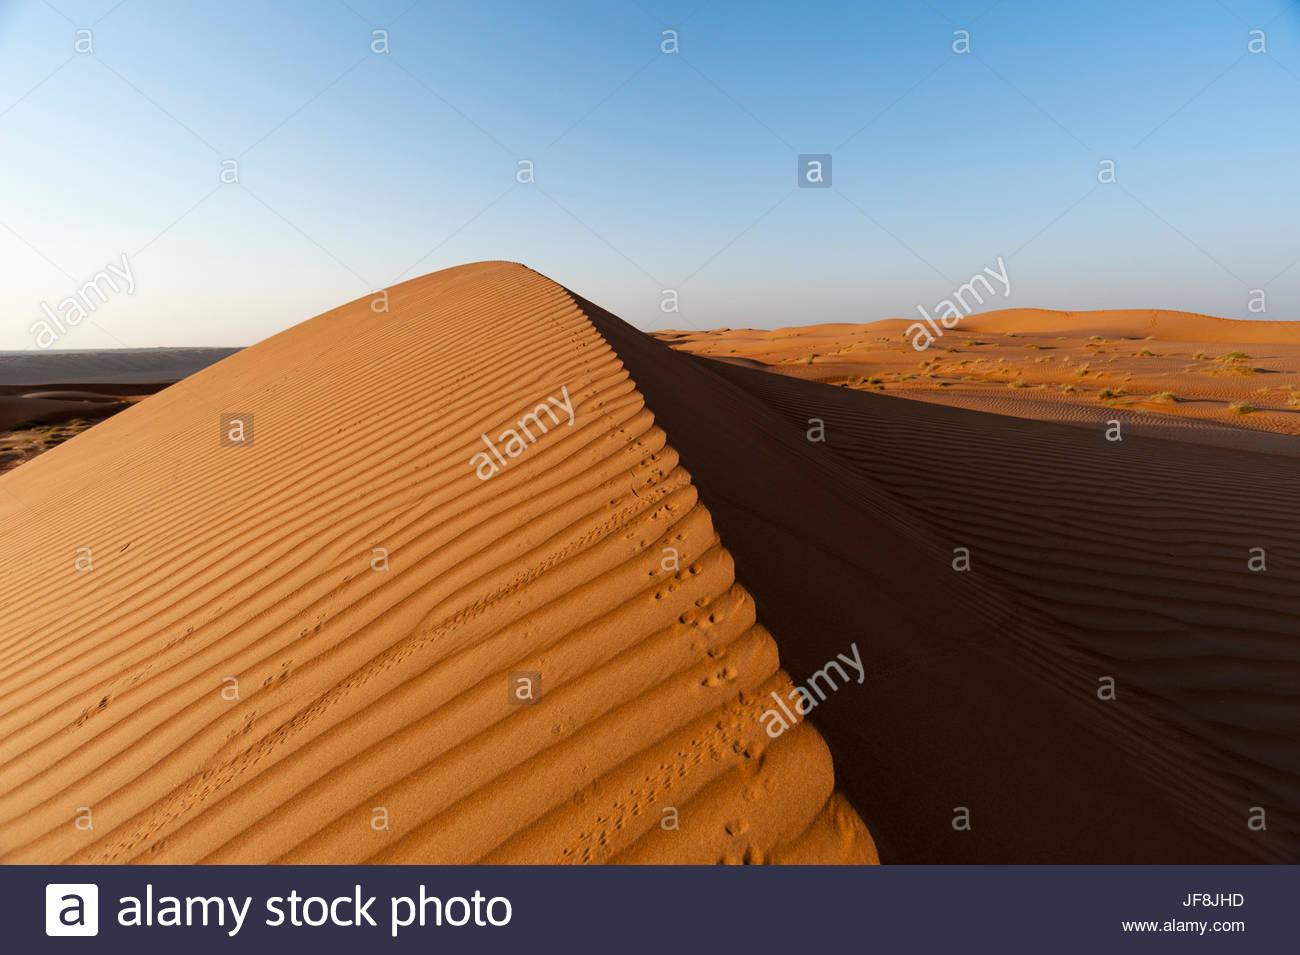 Footprints along the ridge of a sand dune at sunset. - Stock Image